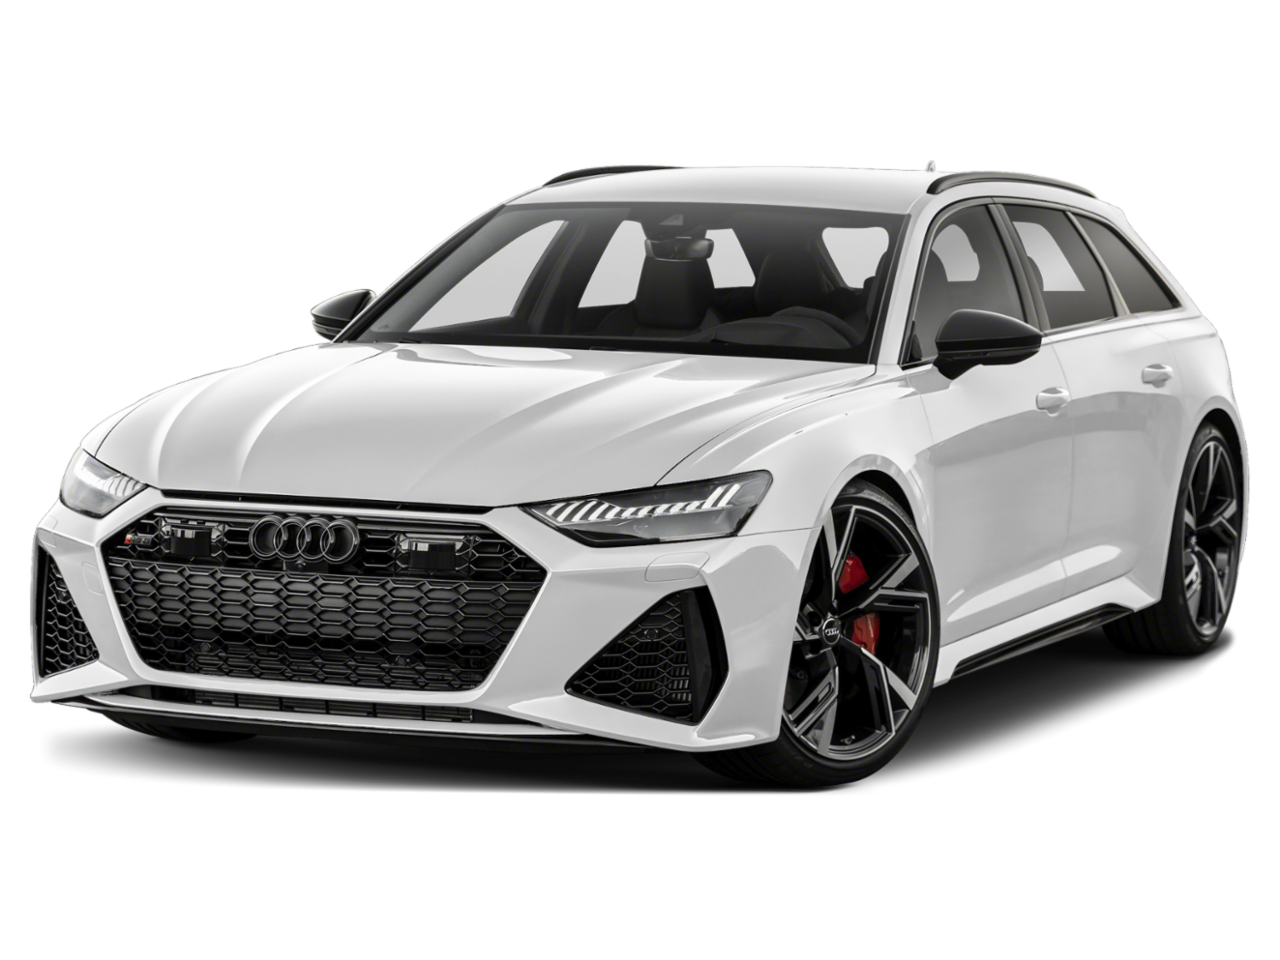 Audi 2021 RS 6 Avant 4.0 TFSI quattro